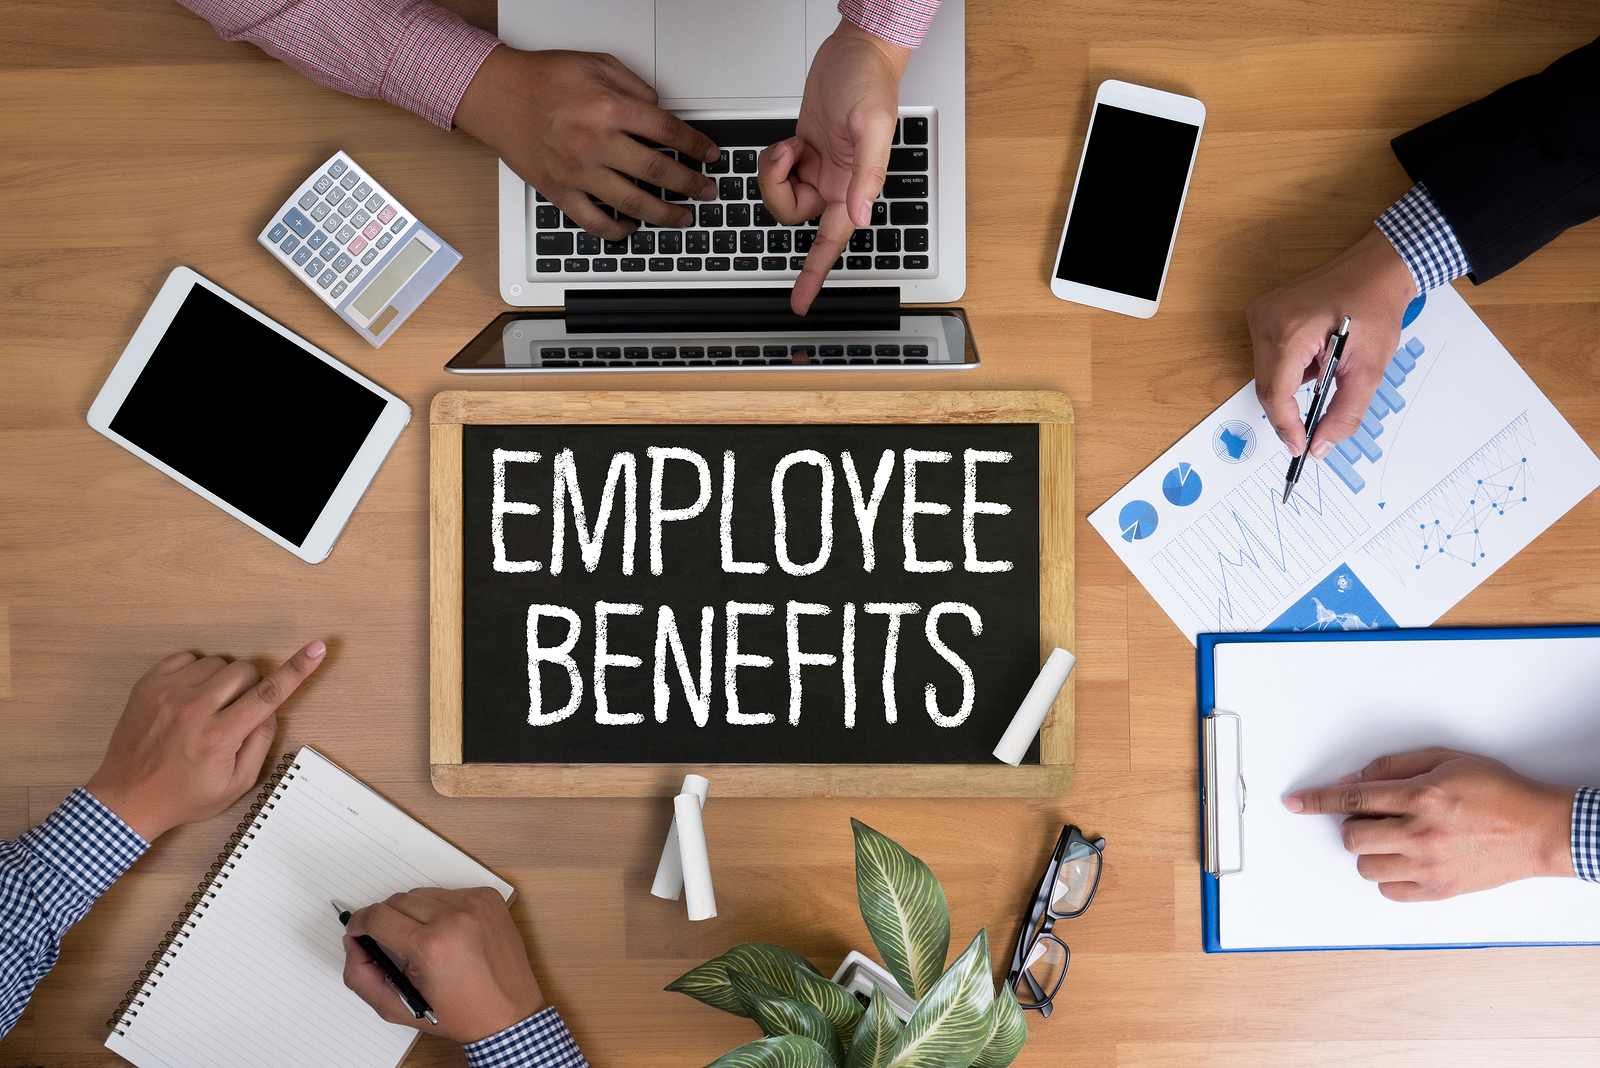 bigstock-Employee-Benefits-Man-Working--154529639-1